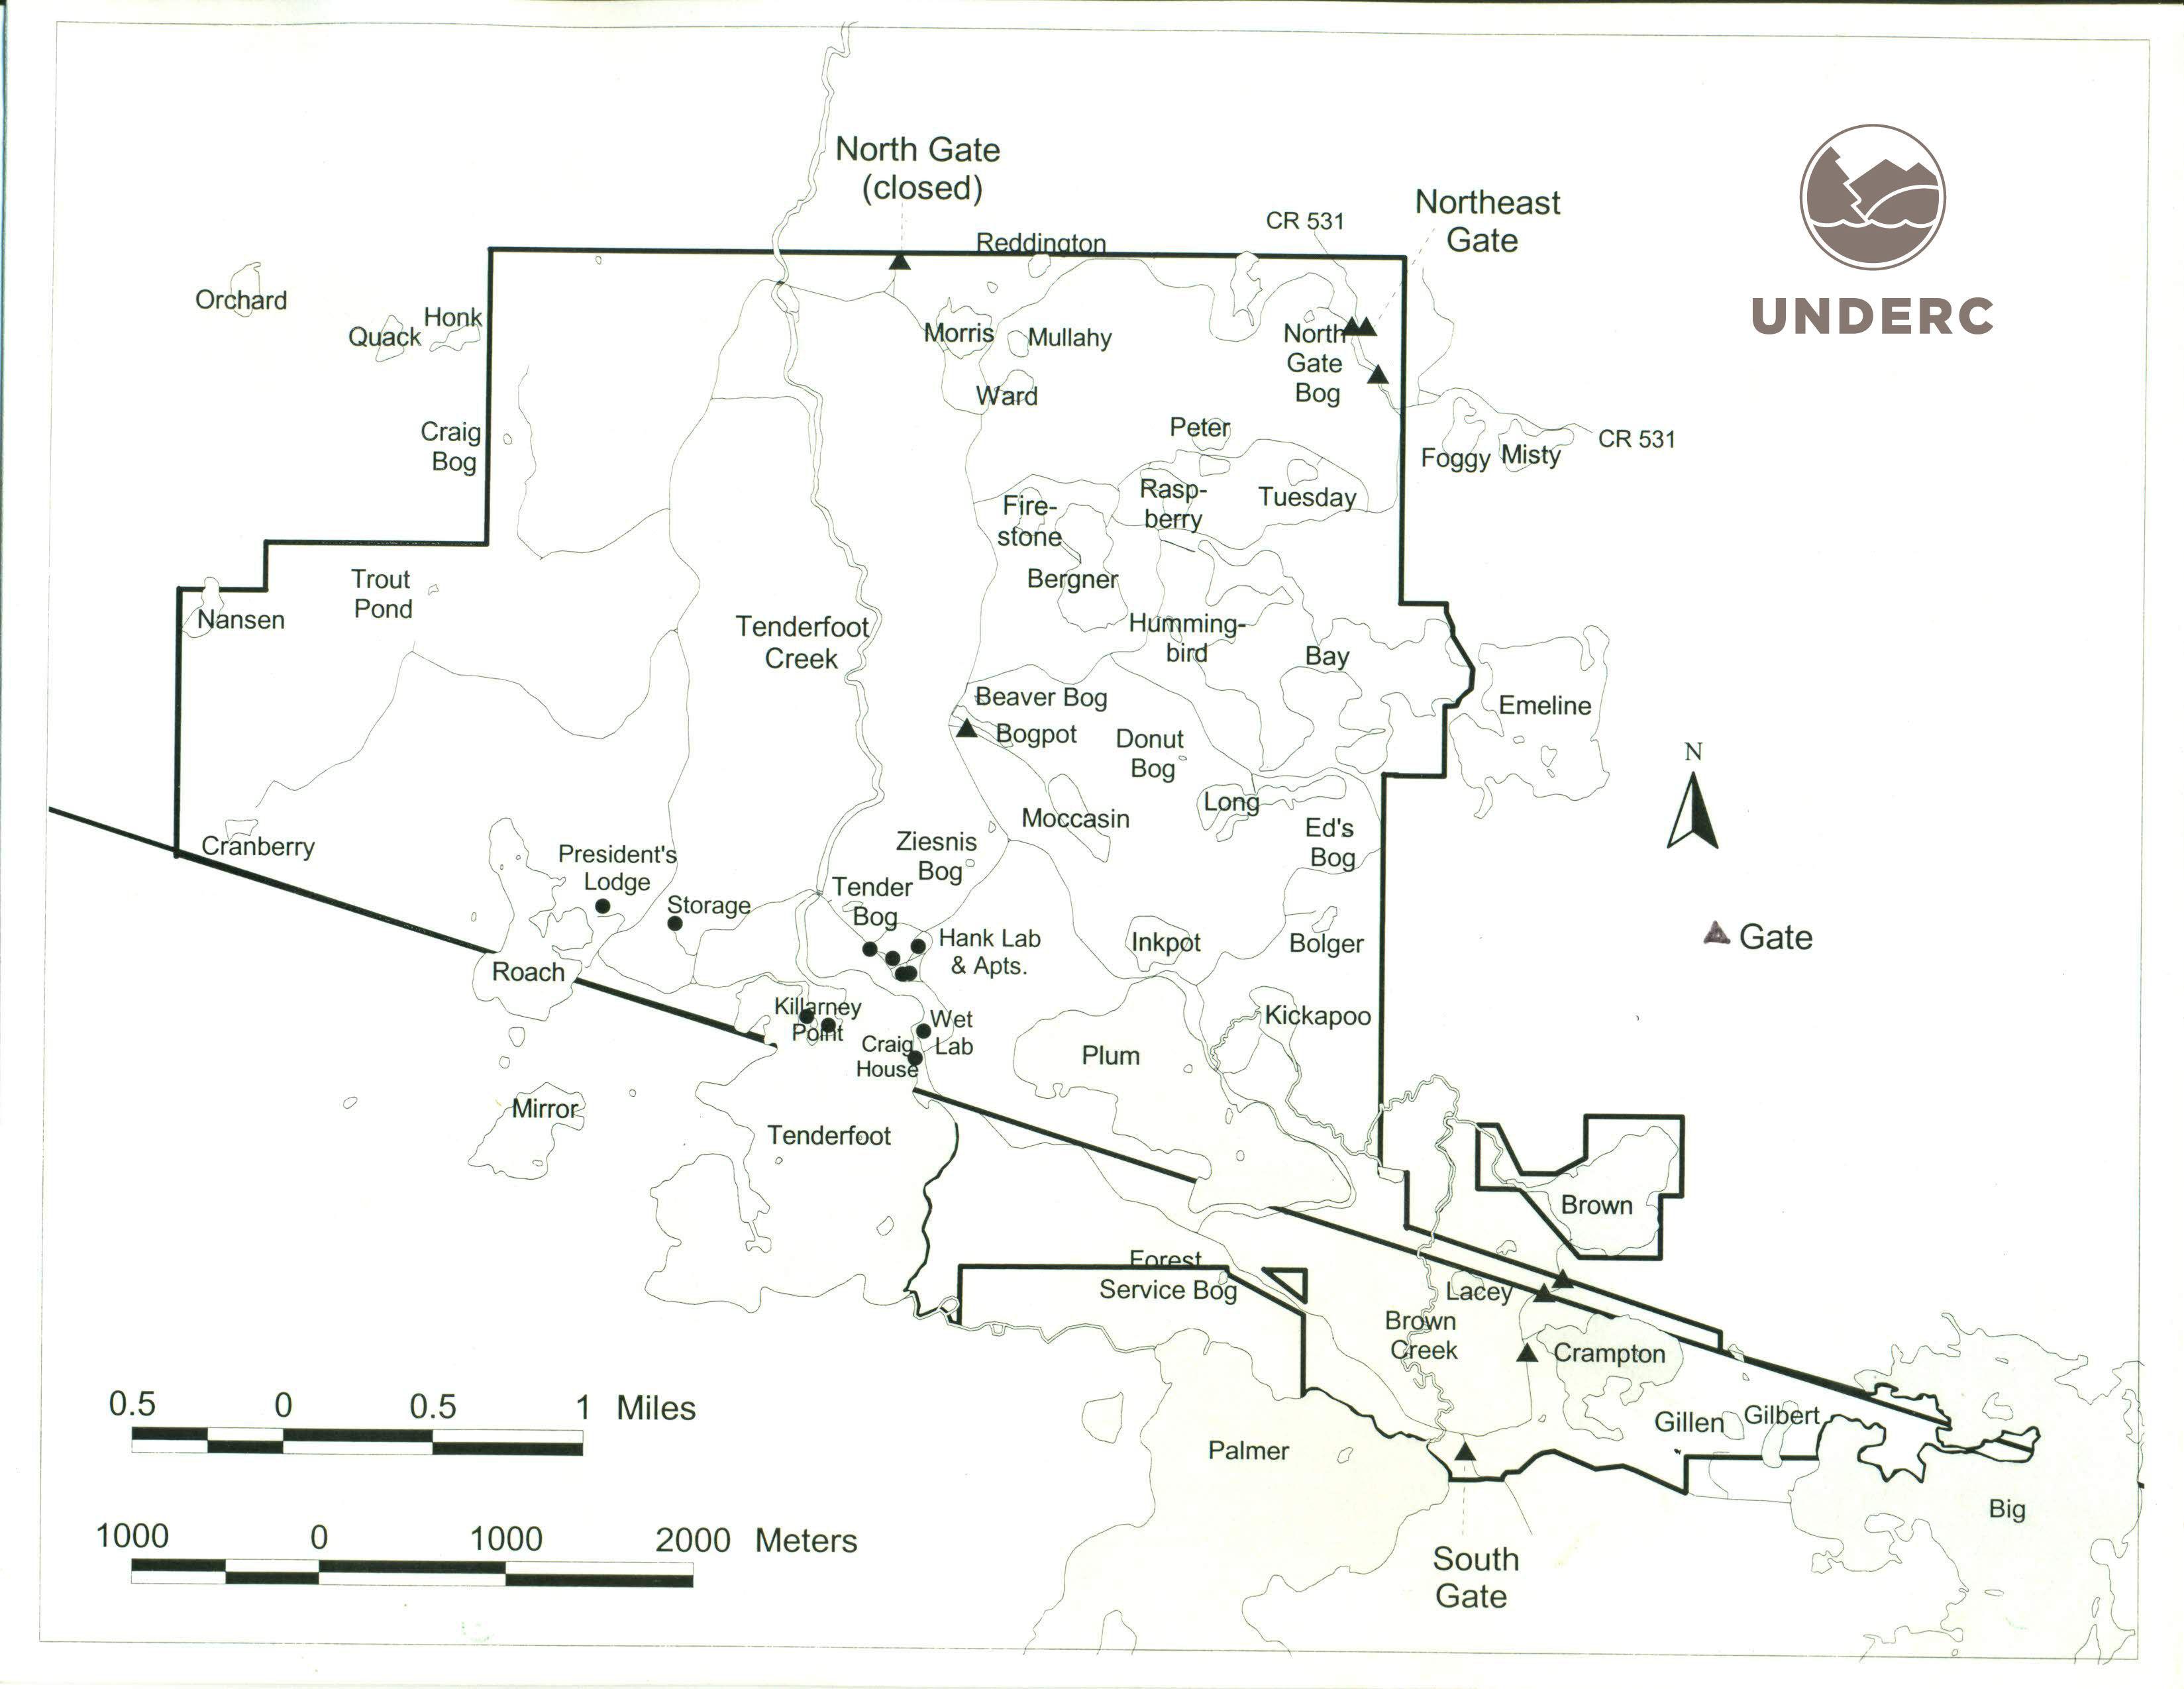 property maps  underc  university of notre dame - property maps undercmapincolor propertymap